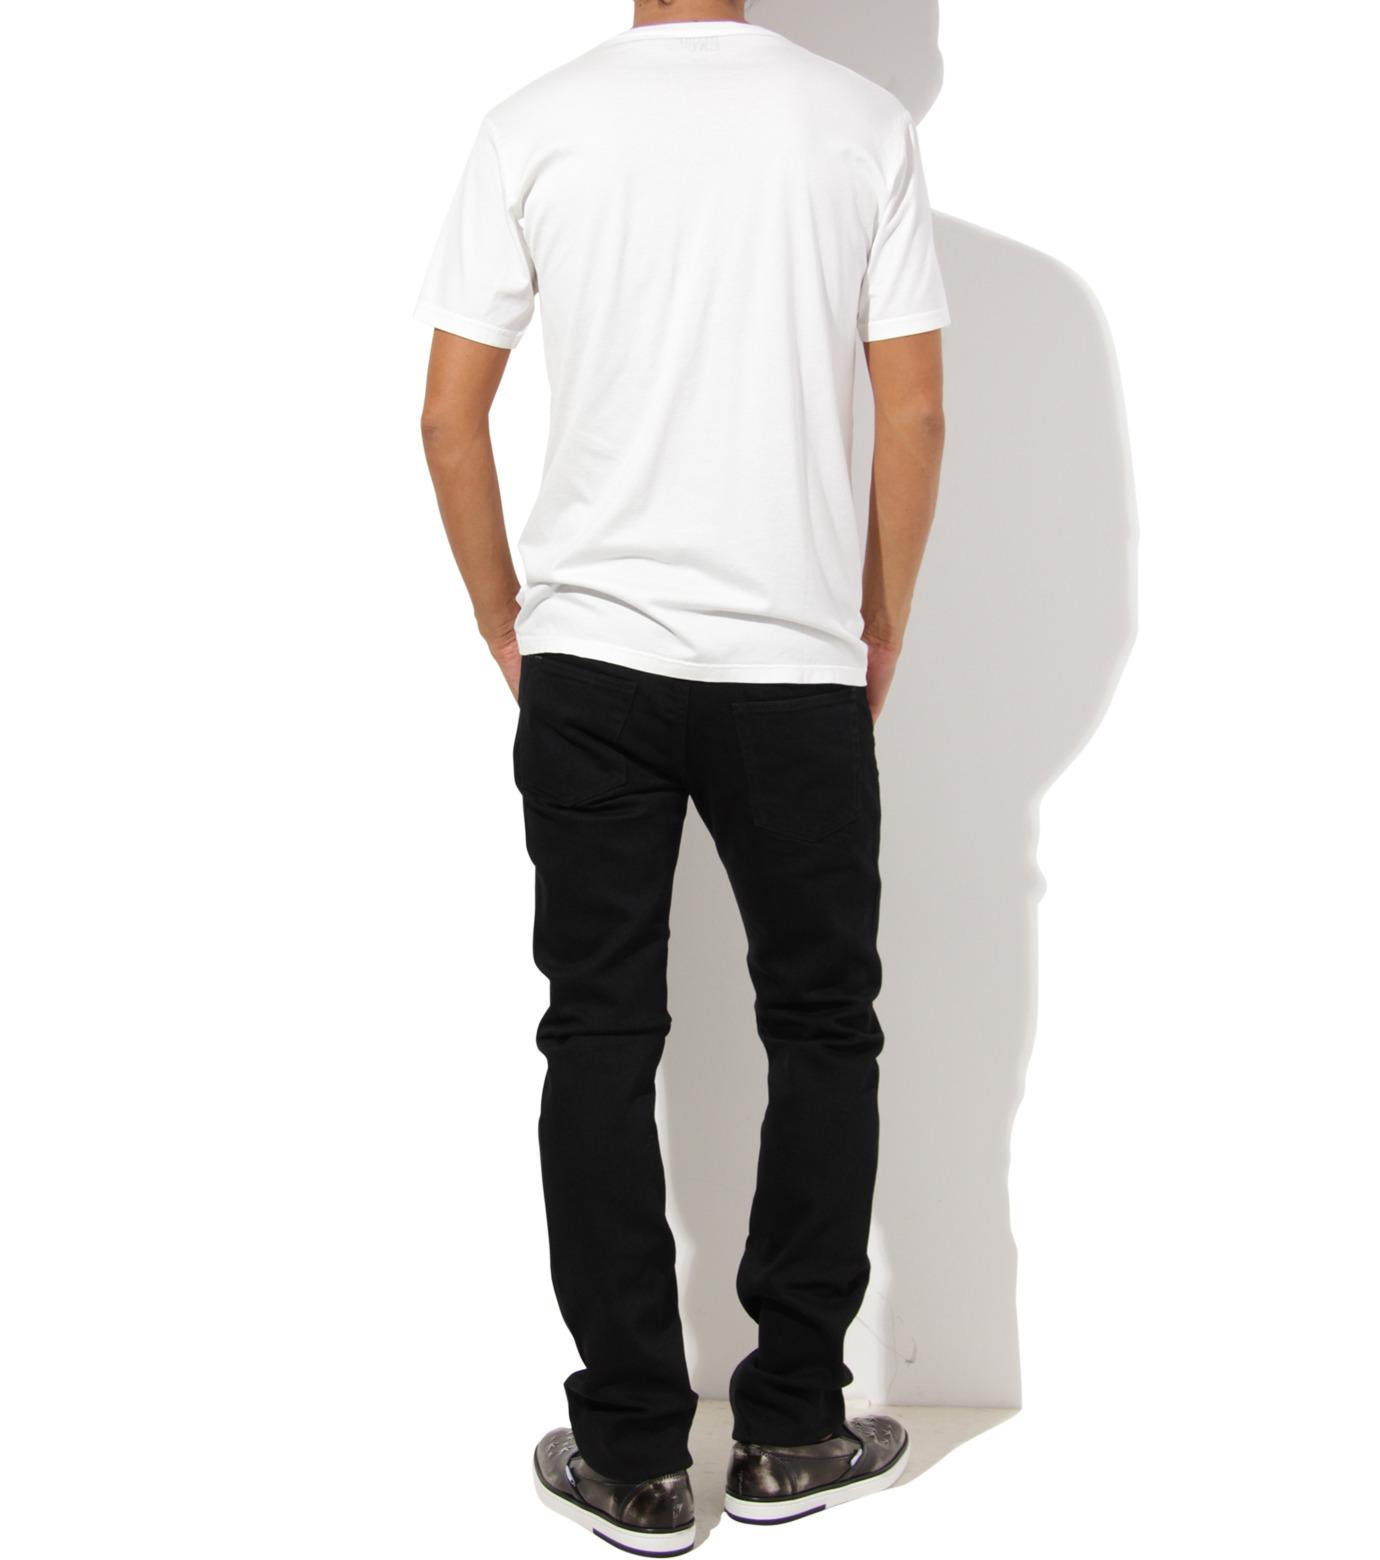 Heddie Lovu(エディー ルーヴ)のV NECK 【SLIM】-WHITE(カットソー/cut and sewn)-ST-S2-00-14A 拡大詳細画像4